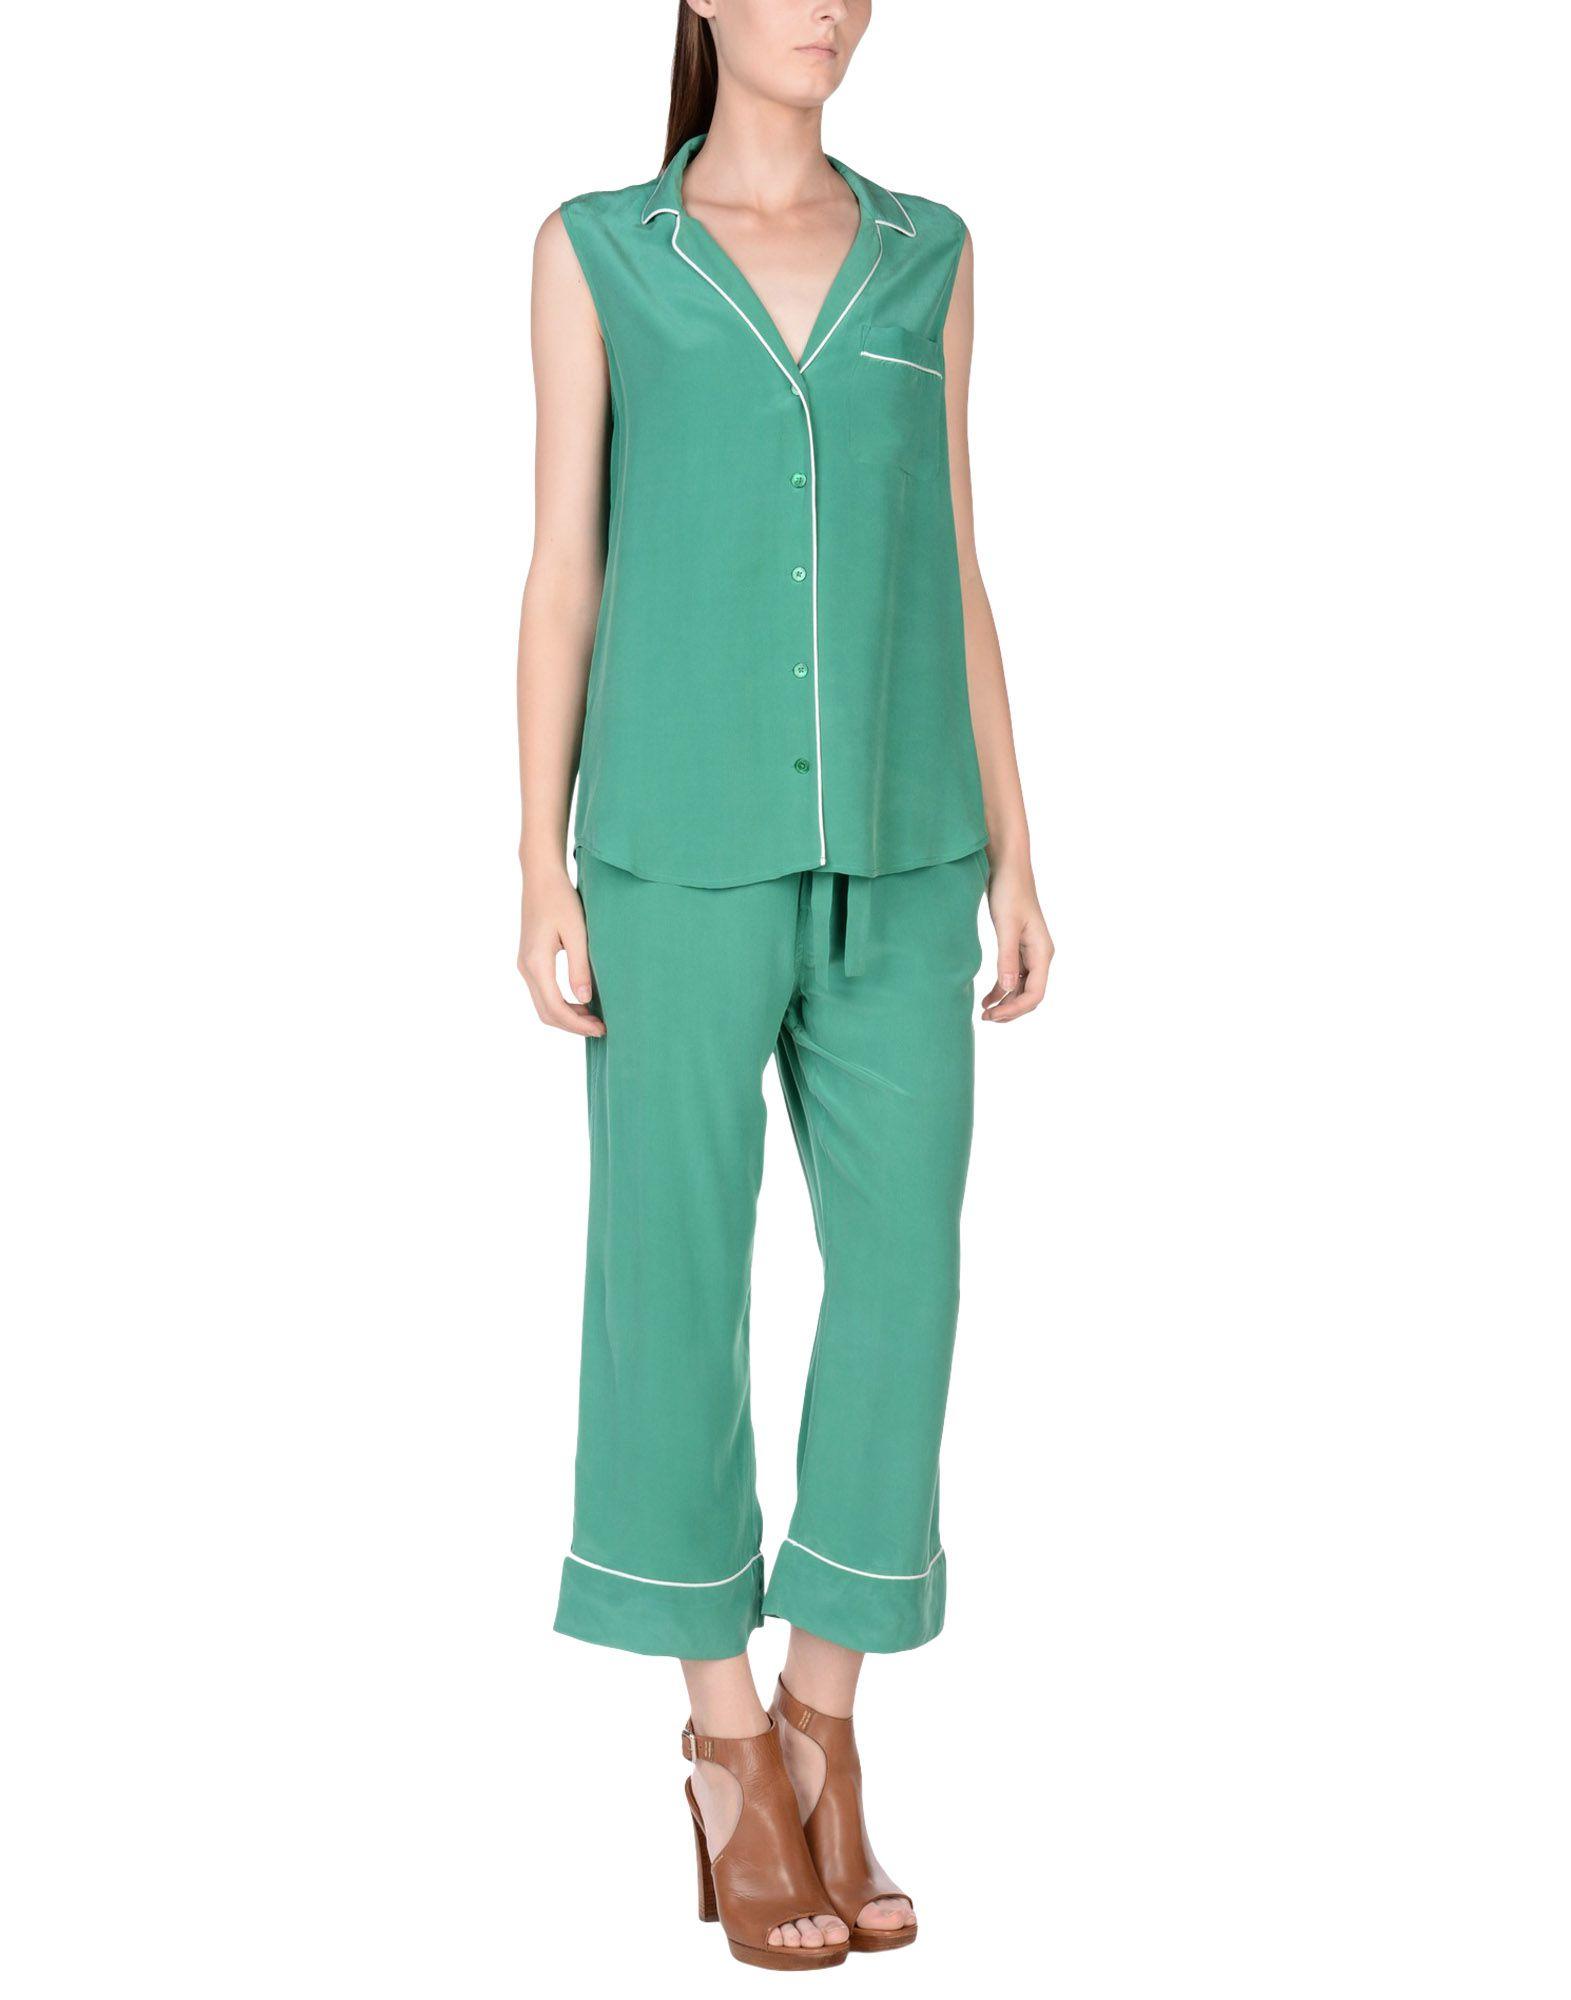 Tailleur Equipment Donna - Acquista online su fhre32Iu